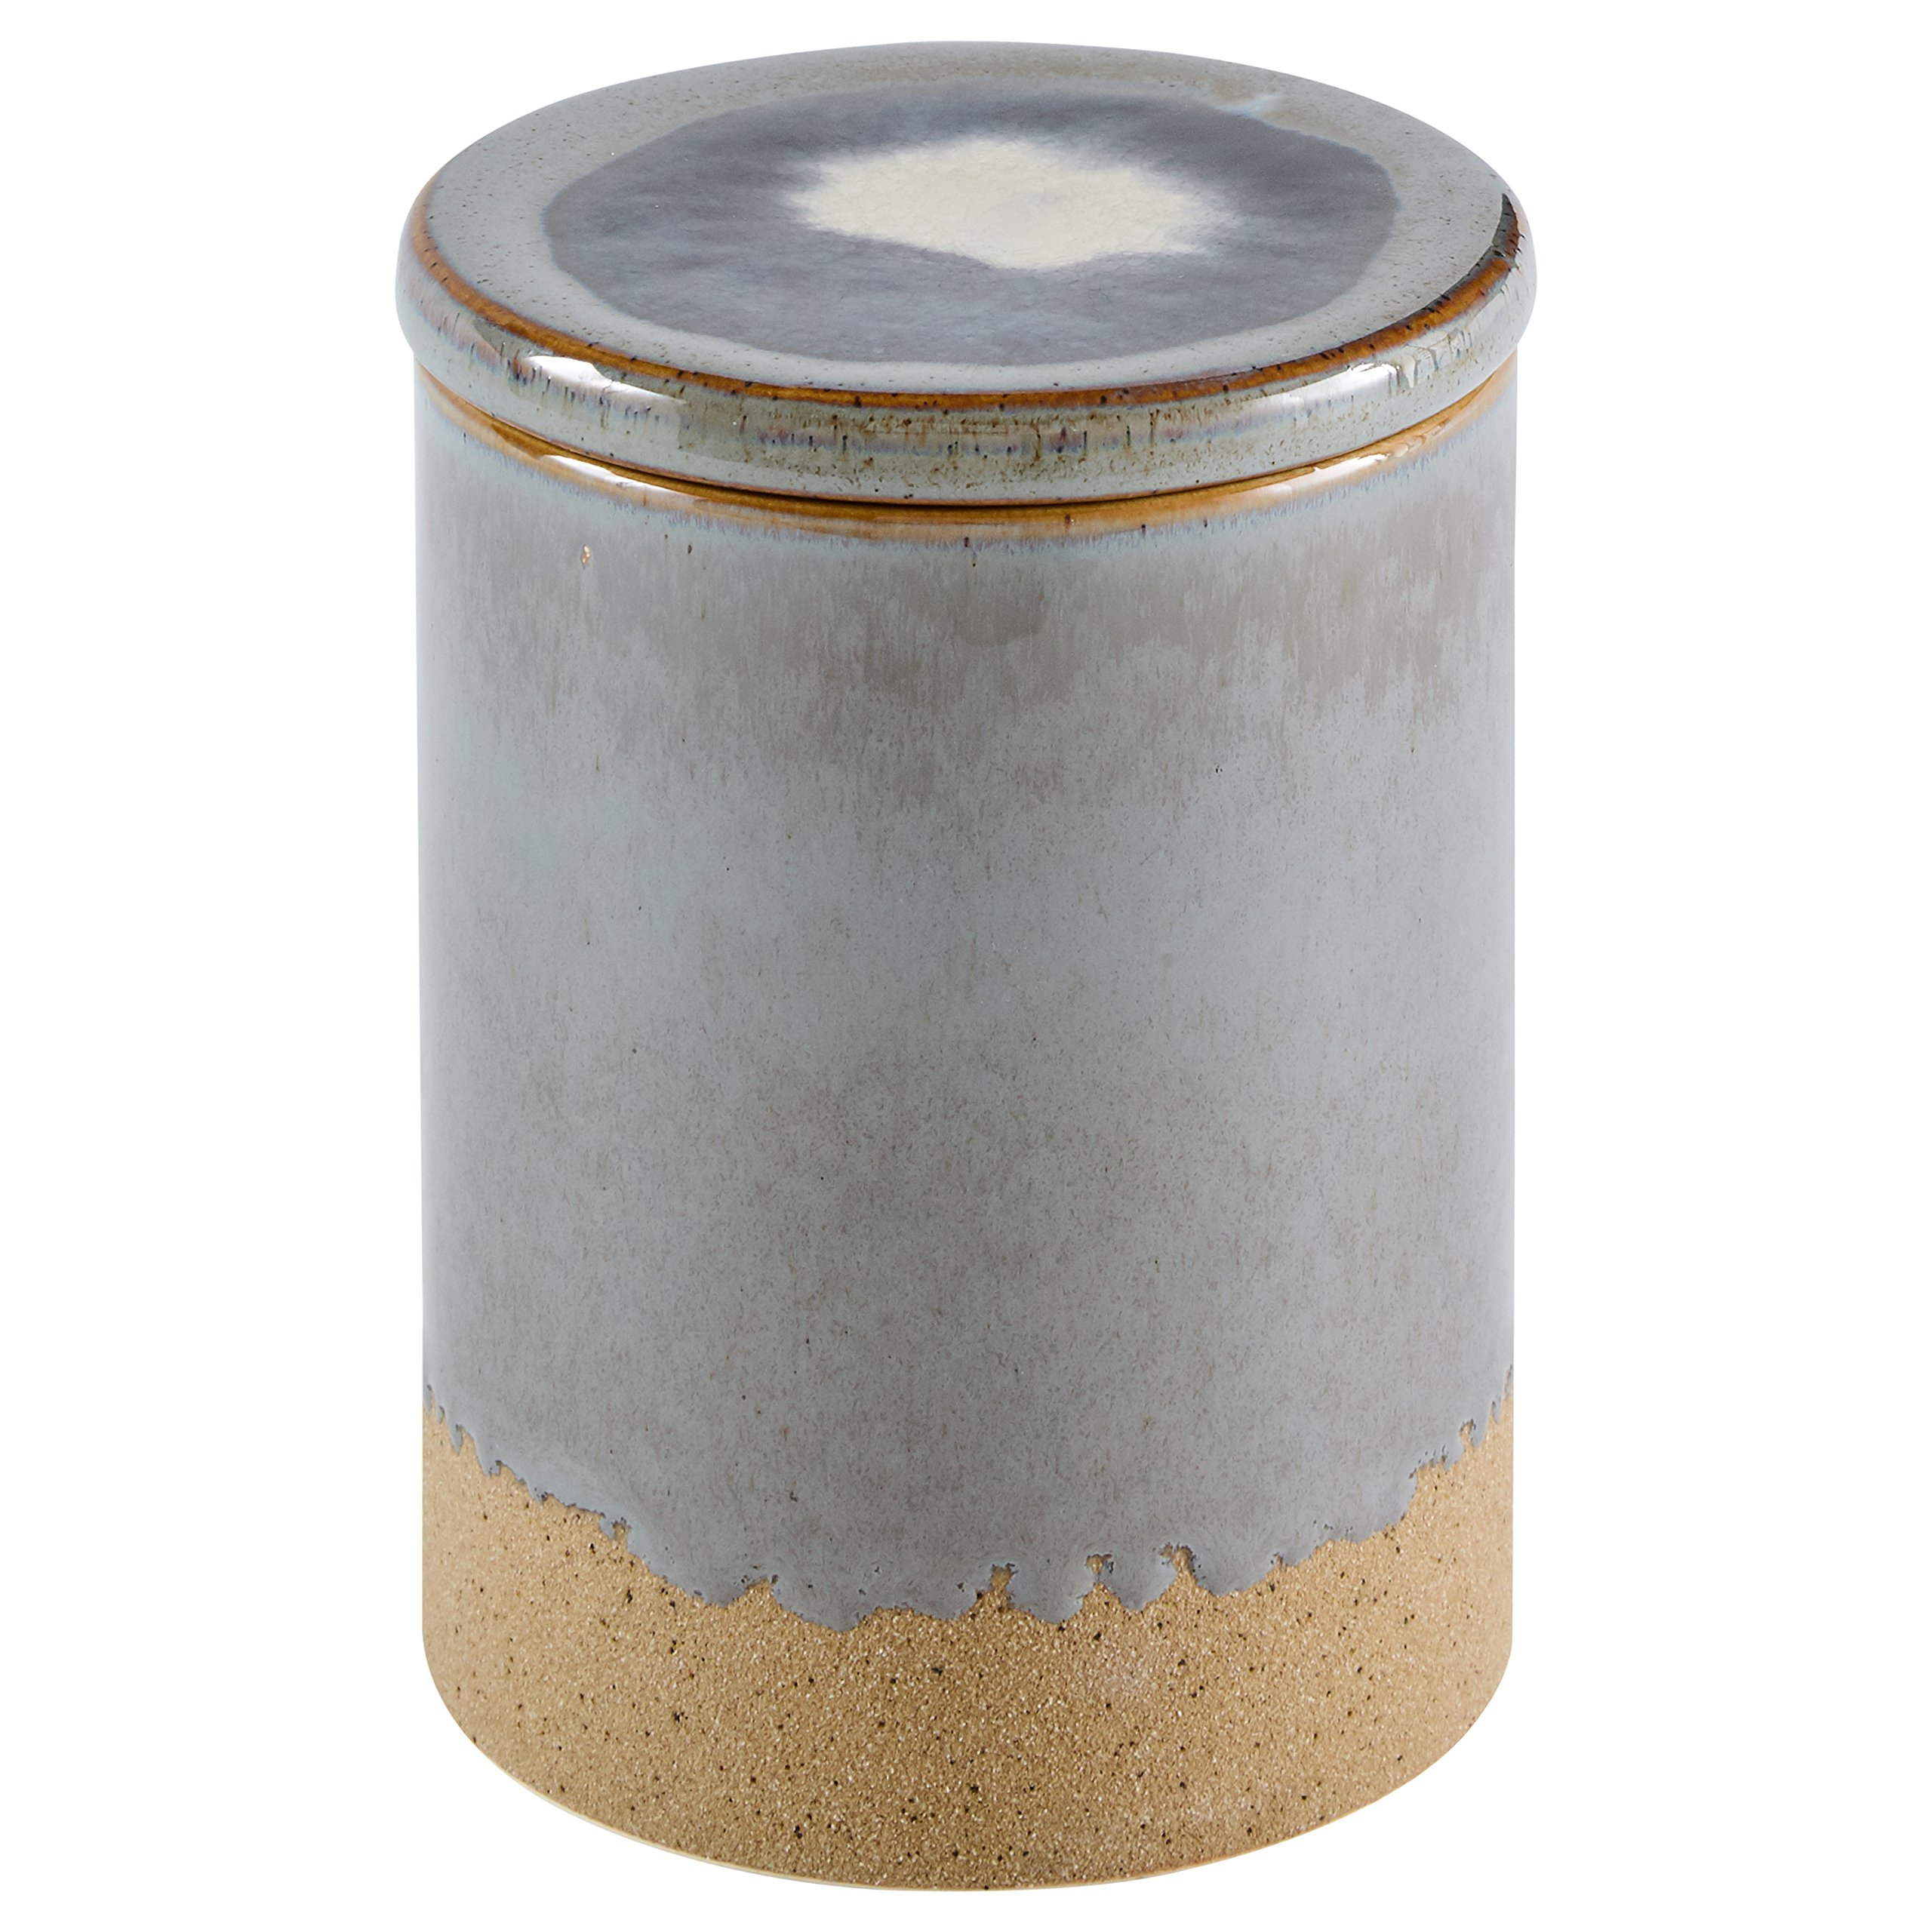 Amazon Brand – Stone & Beam Organic-Shape Stoneware Round Decorative Organizer Box, 6.4 Inch Height, Blue and Gray